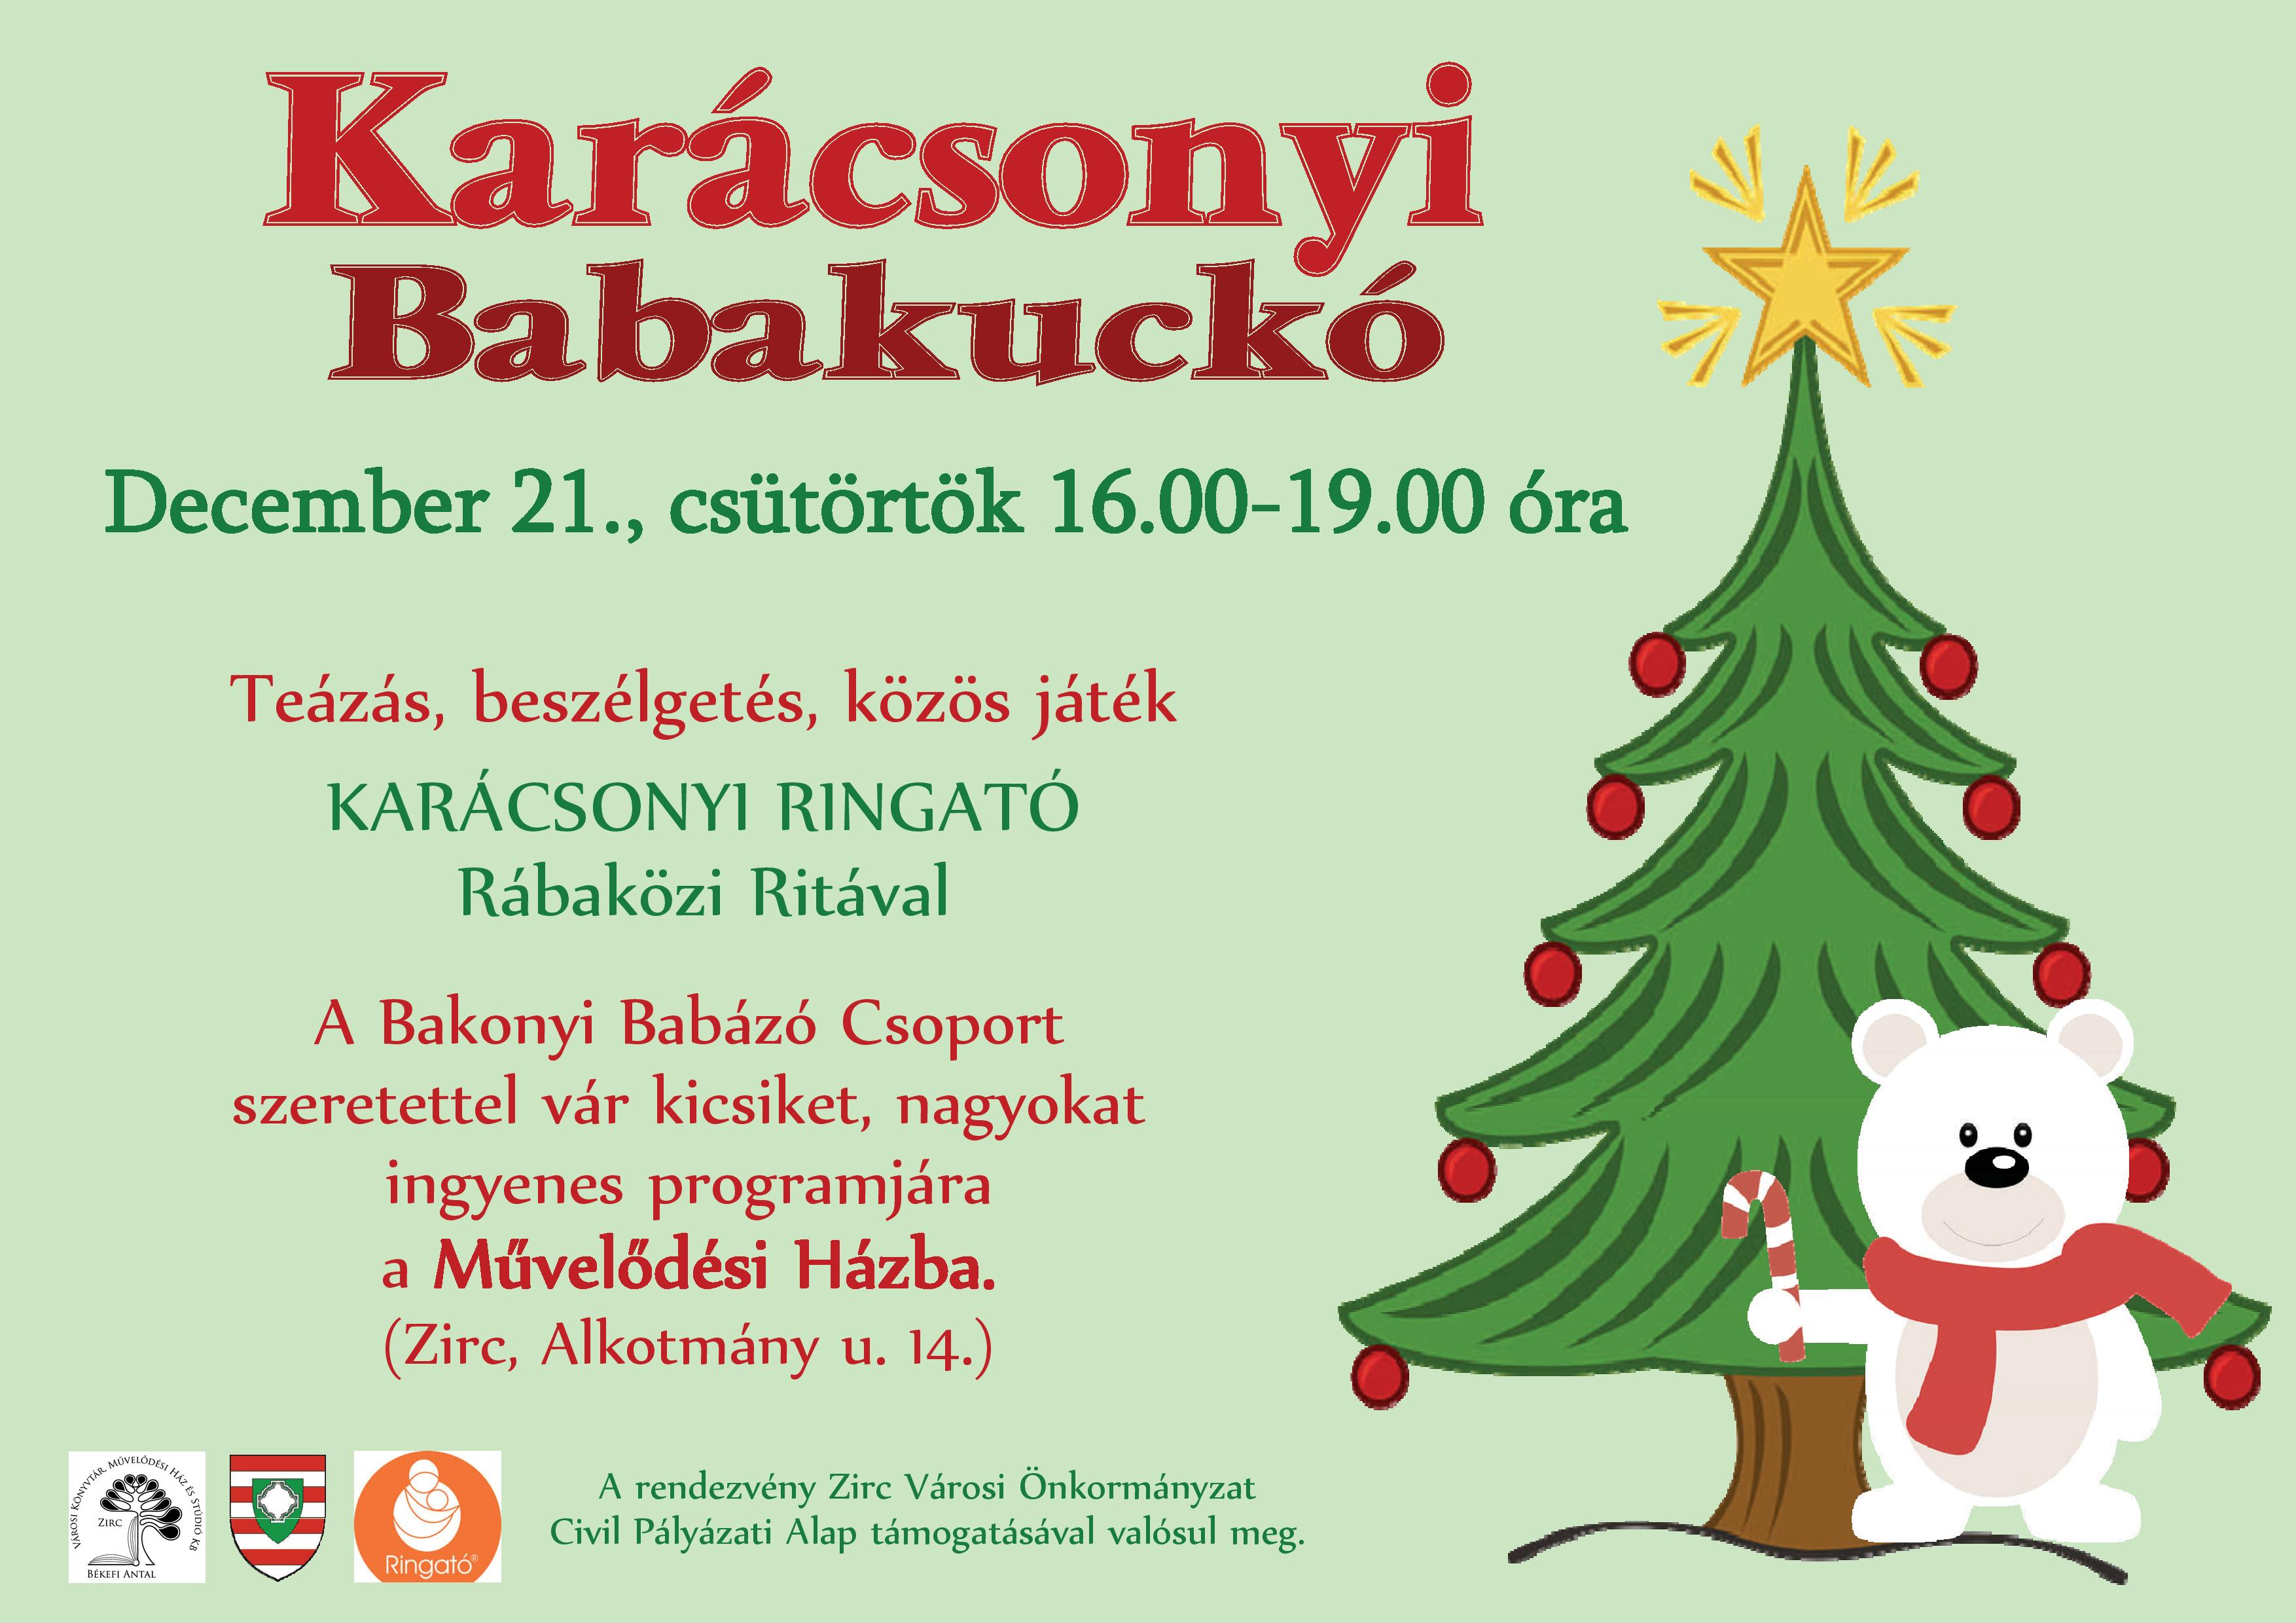 2017-12-21_karacsonyi_babakucko-page-001.jpg